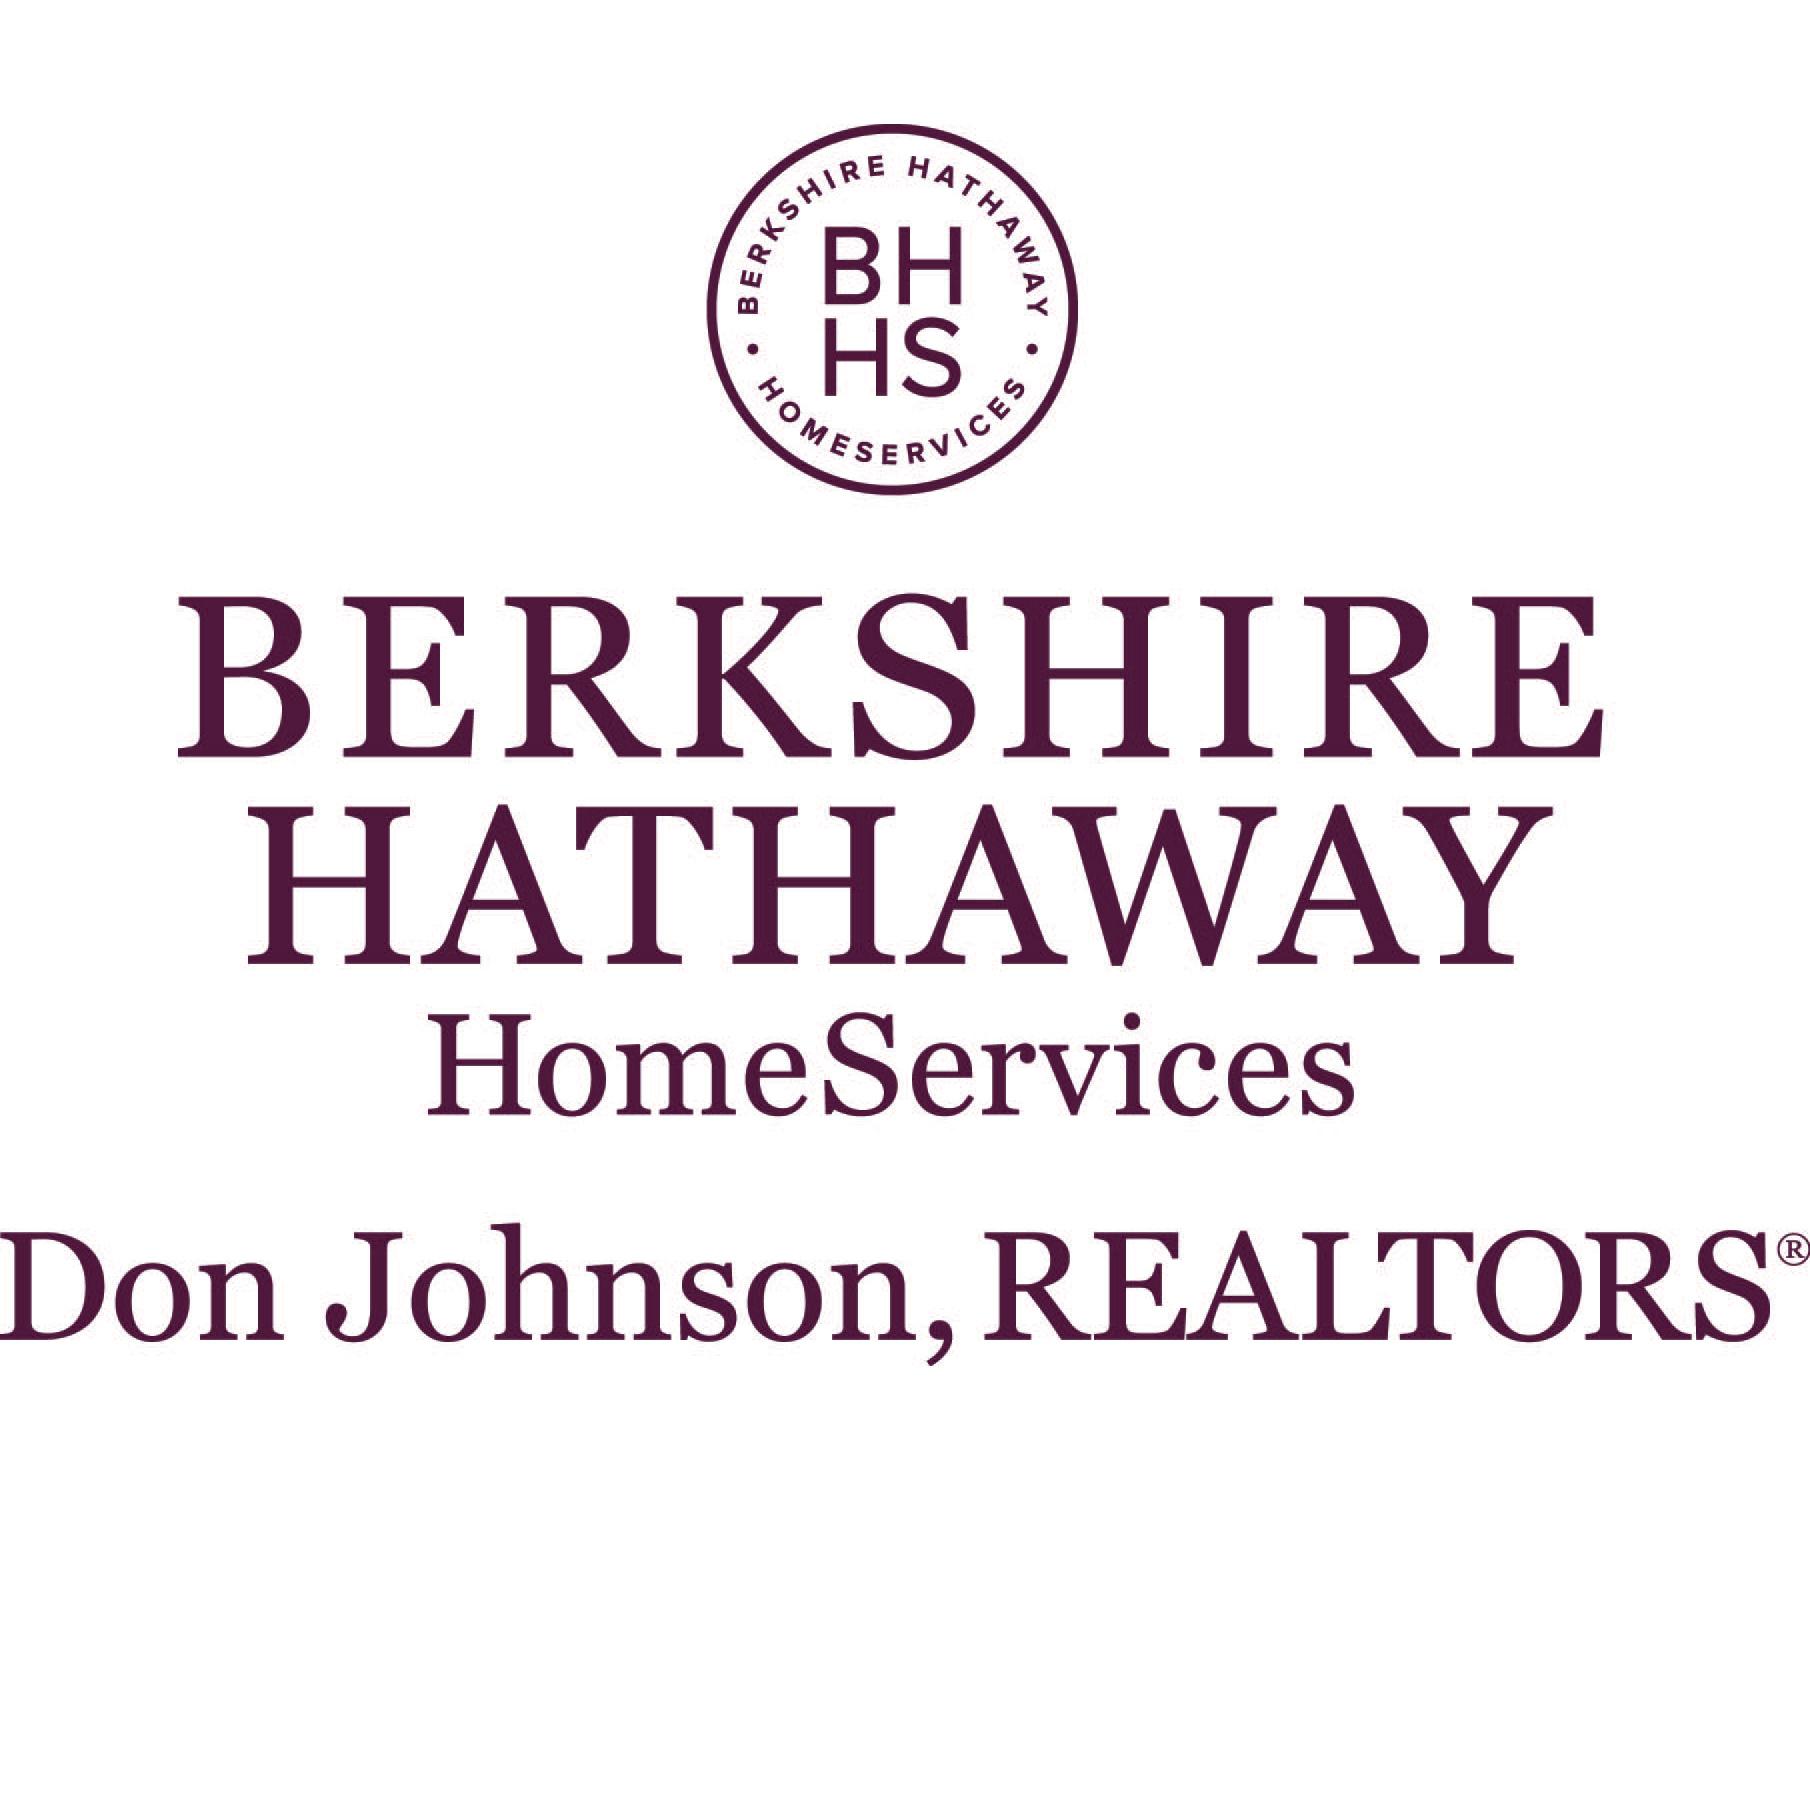 Berkshire Hathaway HomeServices Don Johnson Realtors